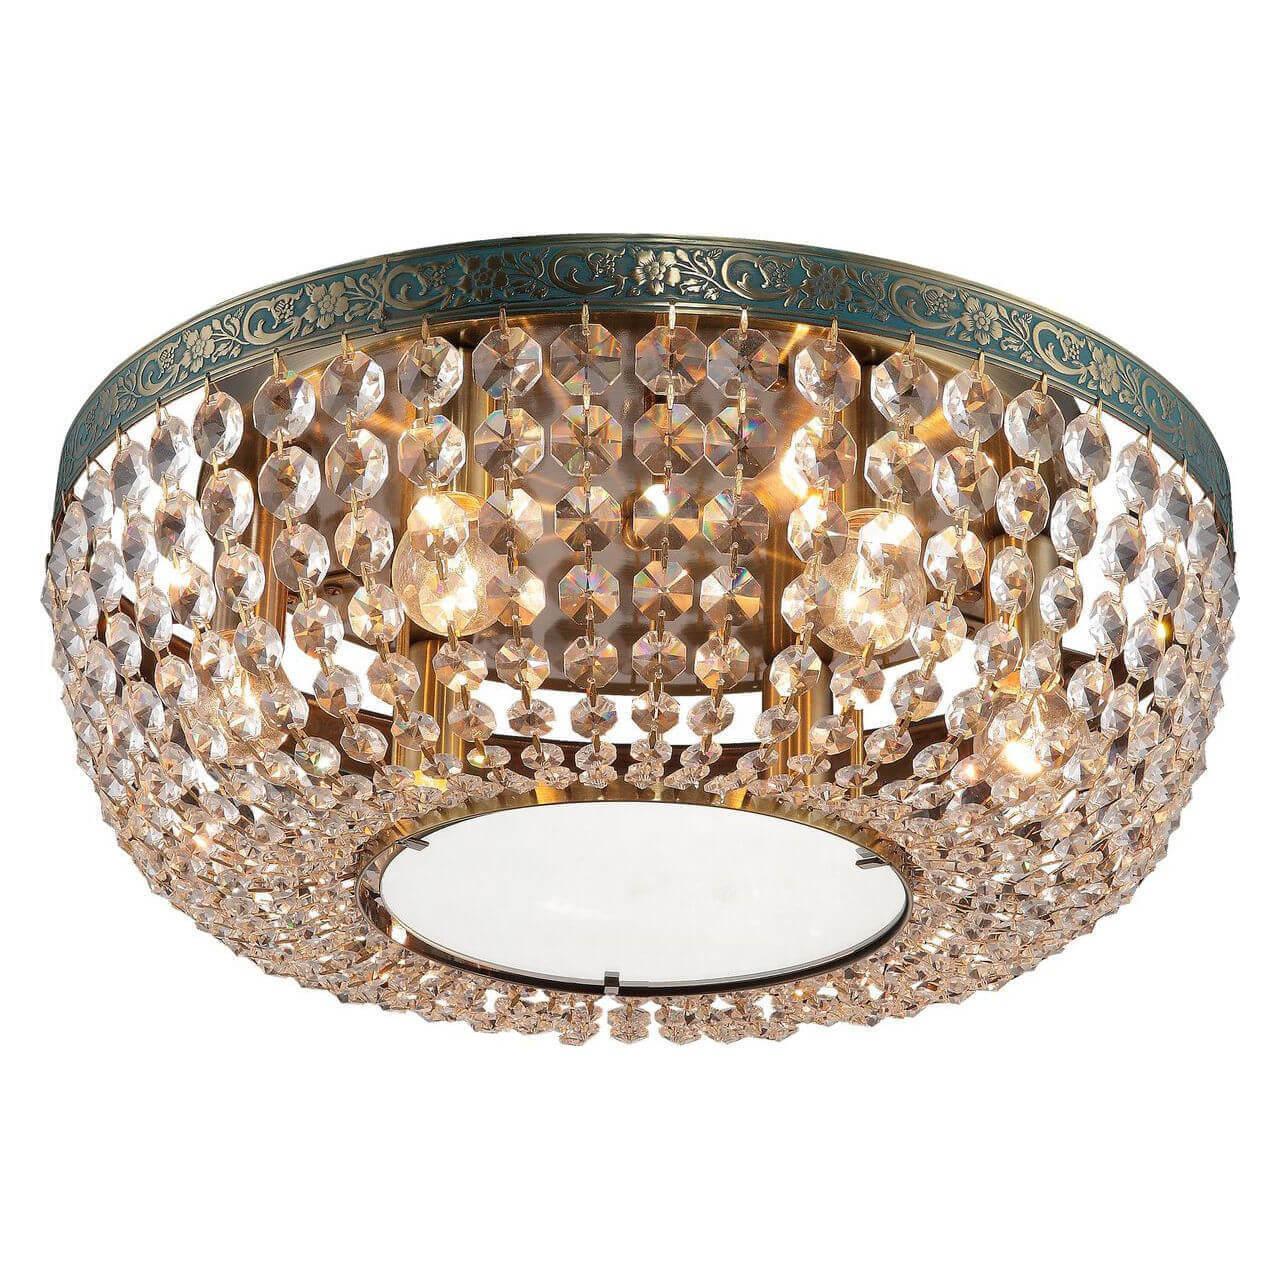 Светильник Toplight TL7240X-06AB Virginia Brass потолочная люстра toplight virginia tl7240x 06ab